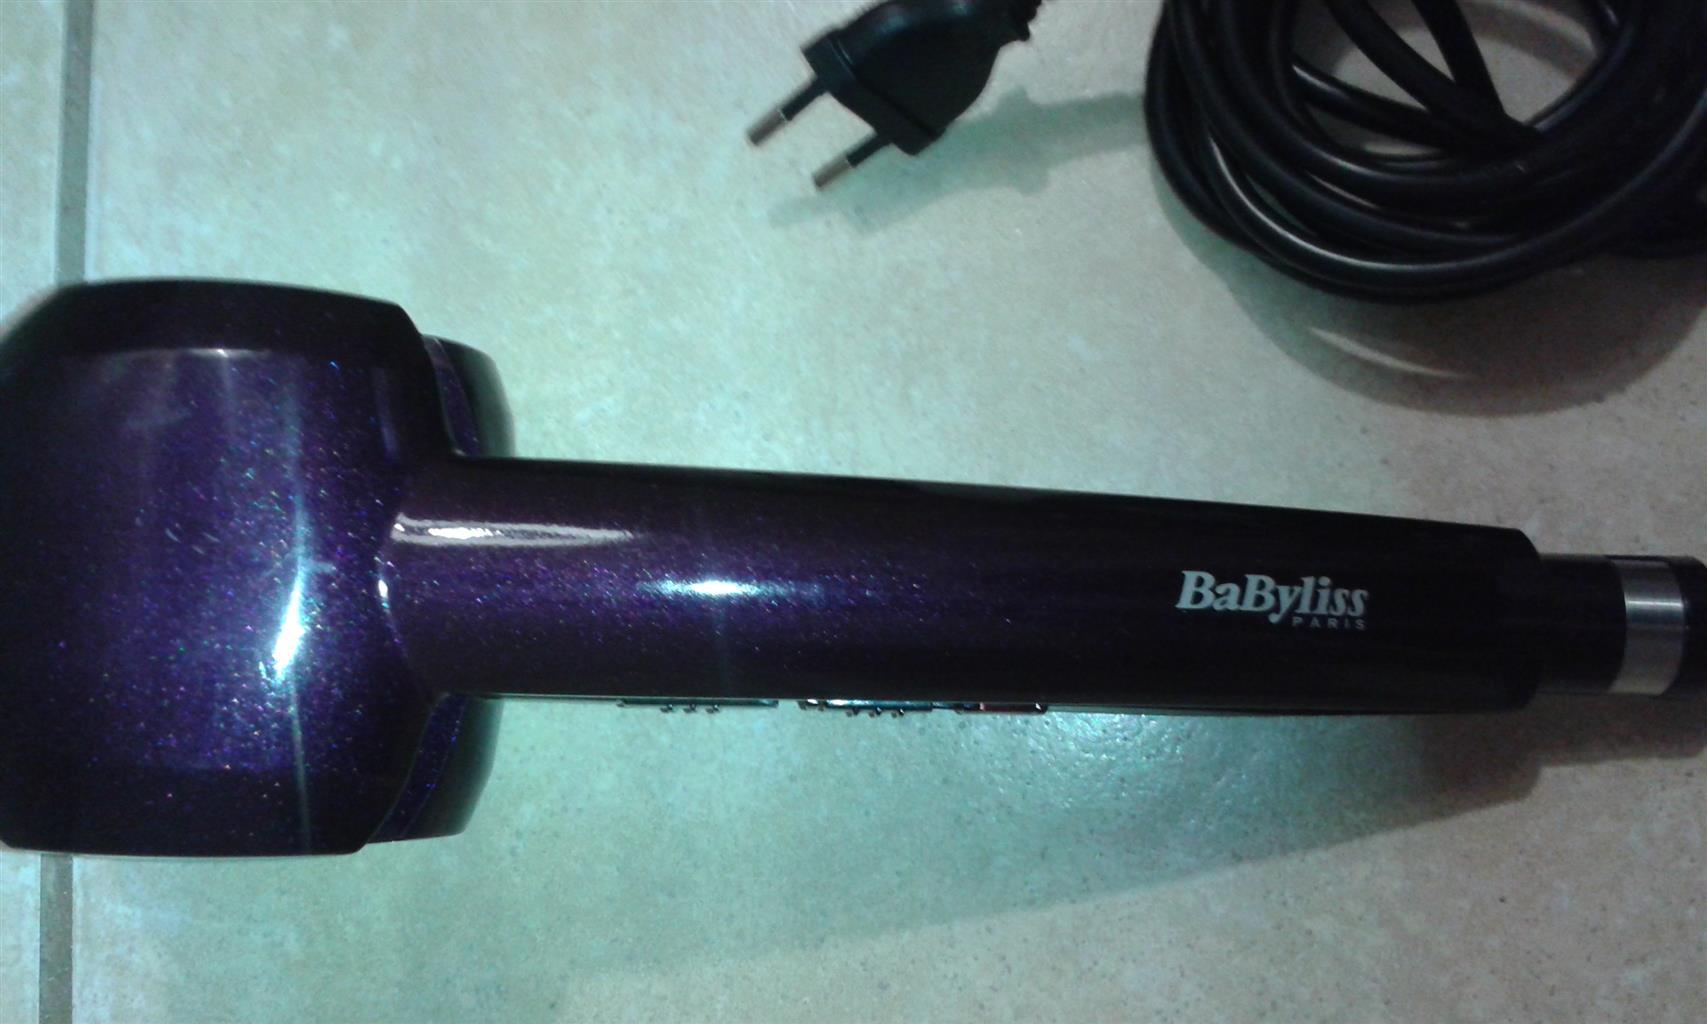 Babyliss hair curler